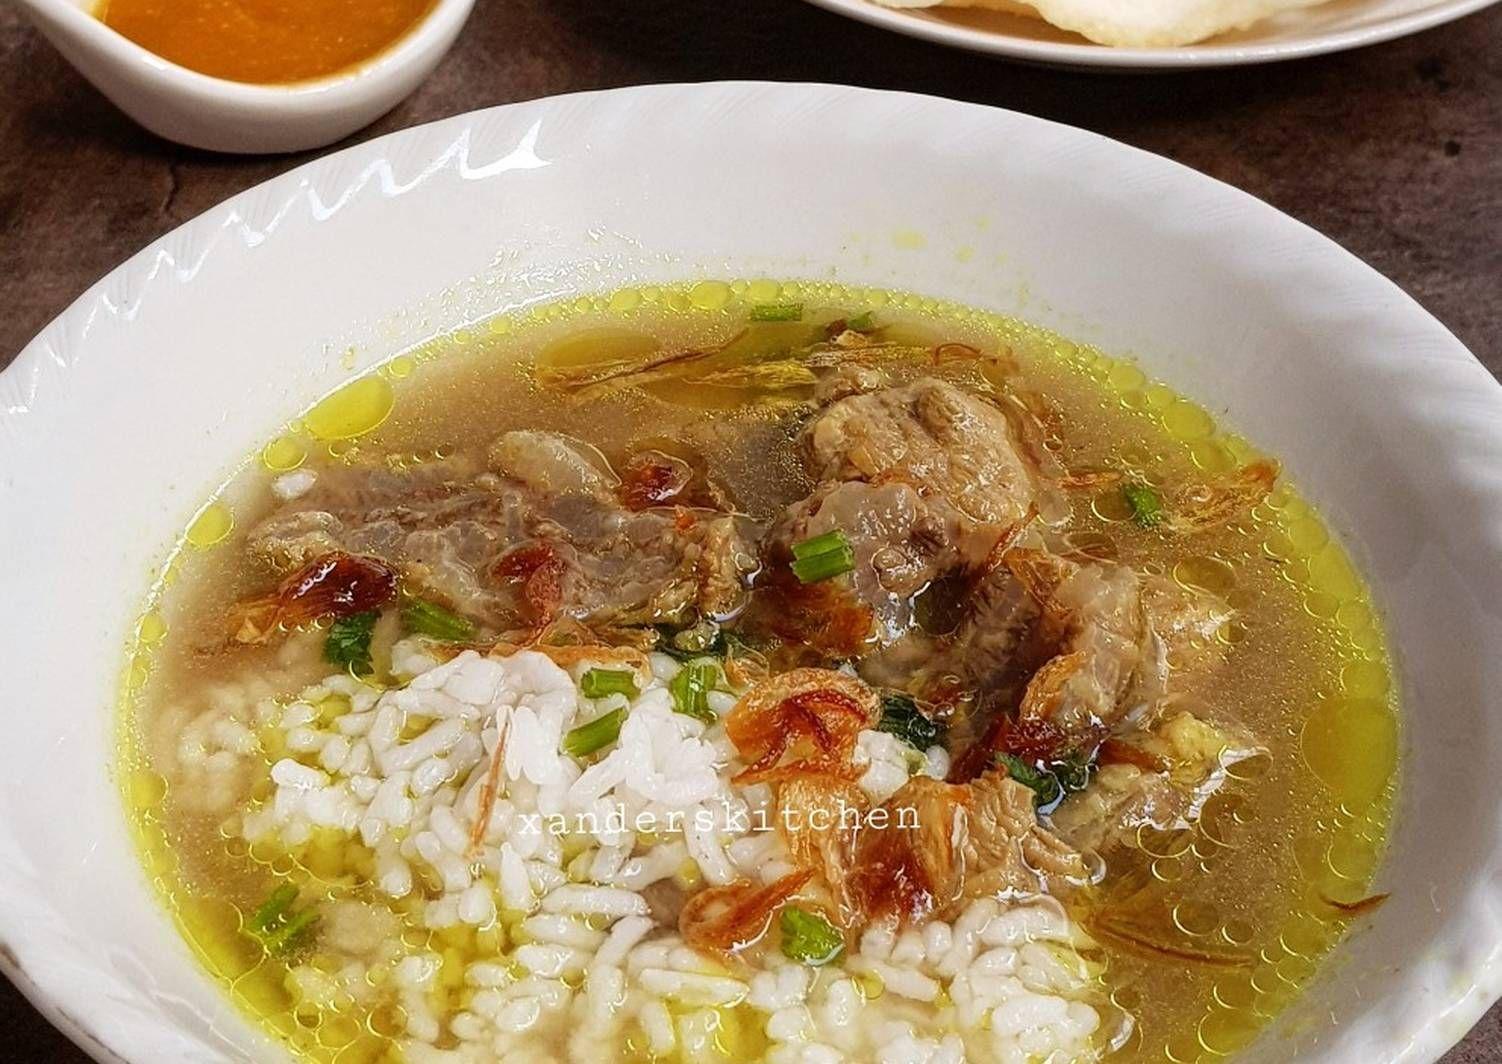 Resep Soto Daging Madura Oleh Xander S Kitchen Resep Resep Masakan Resep Makanan Asia Masakan